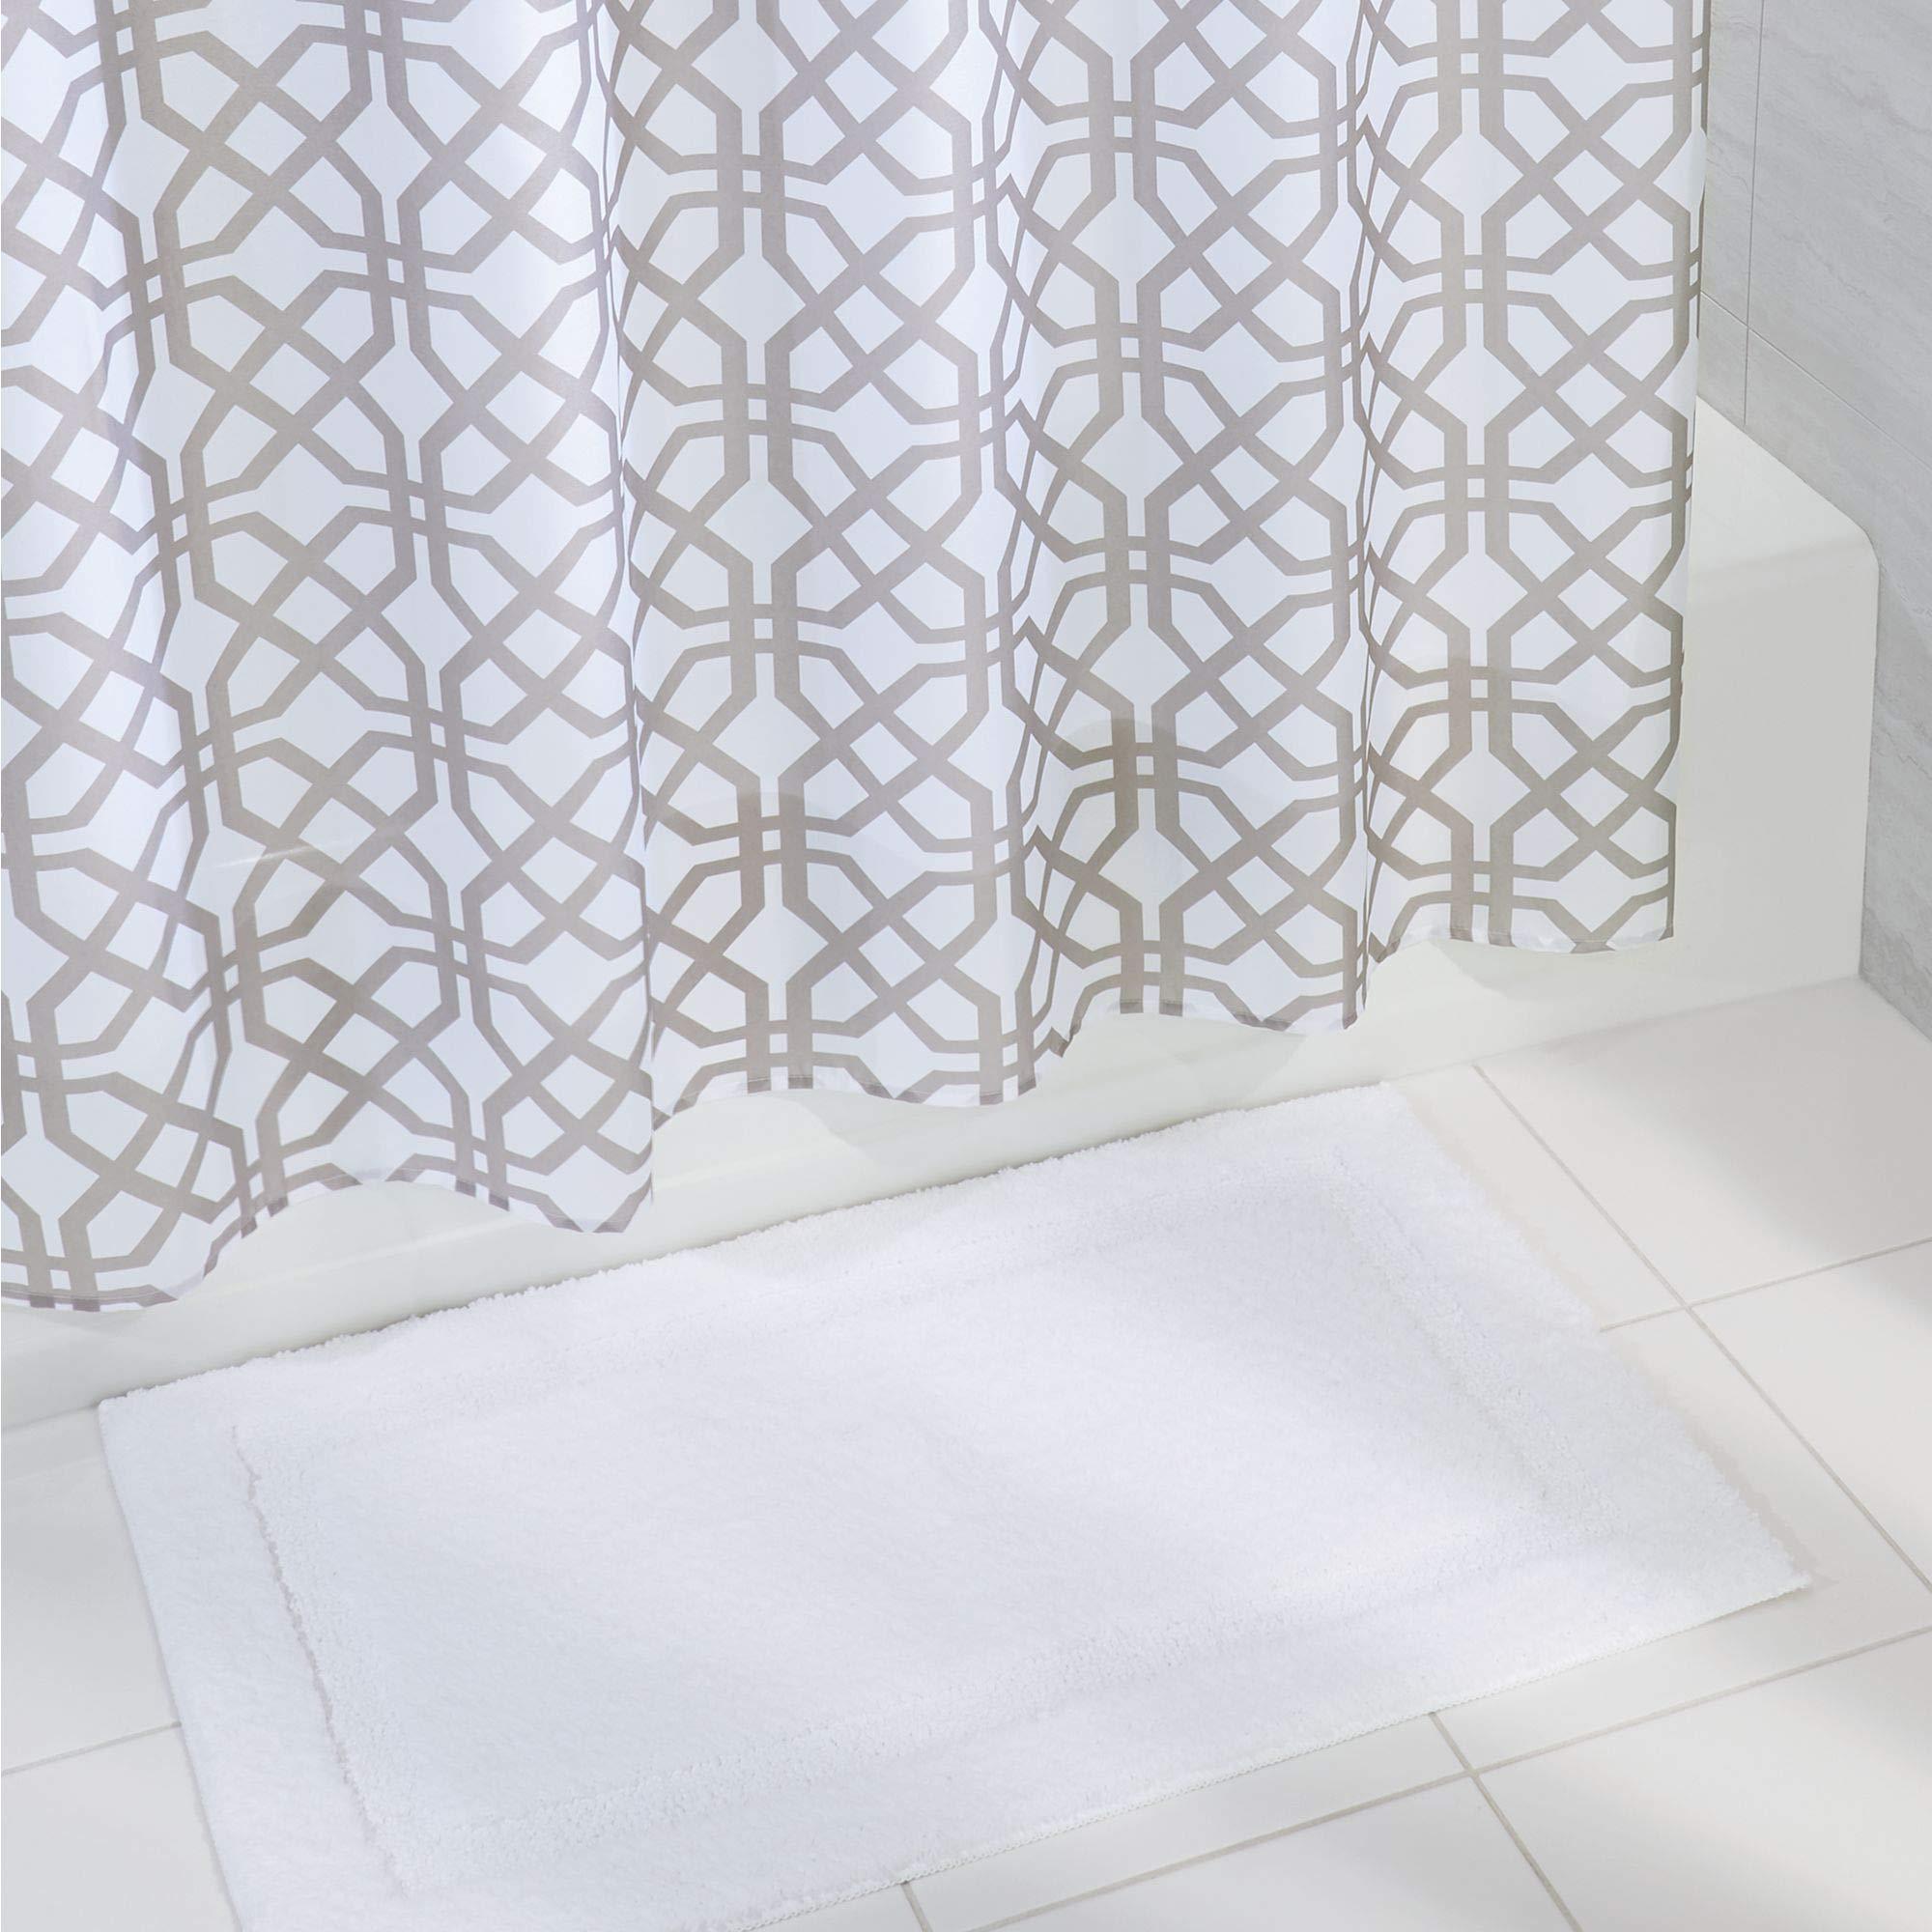 mDesign Bathroom Accessory Set, Fretwork Fabric Shower Curtain, Spa Bath Mat/Rug - Set of 2, Stone Gray/White